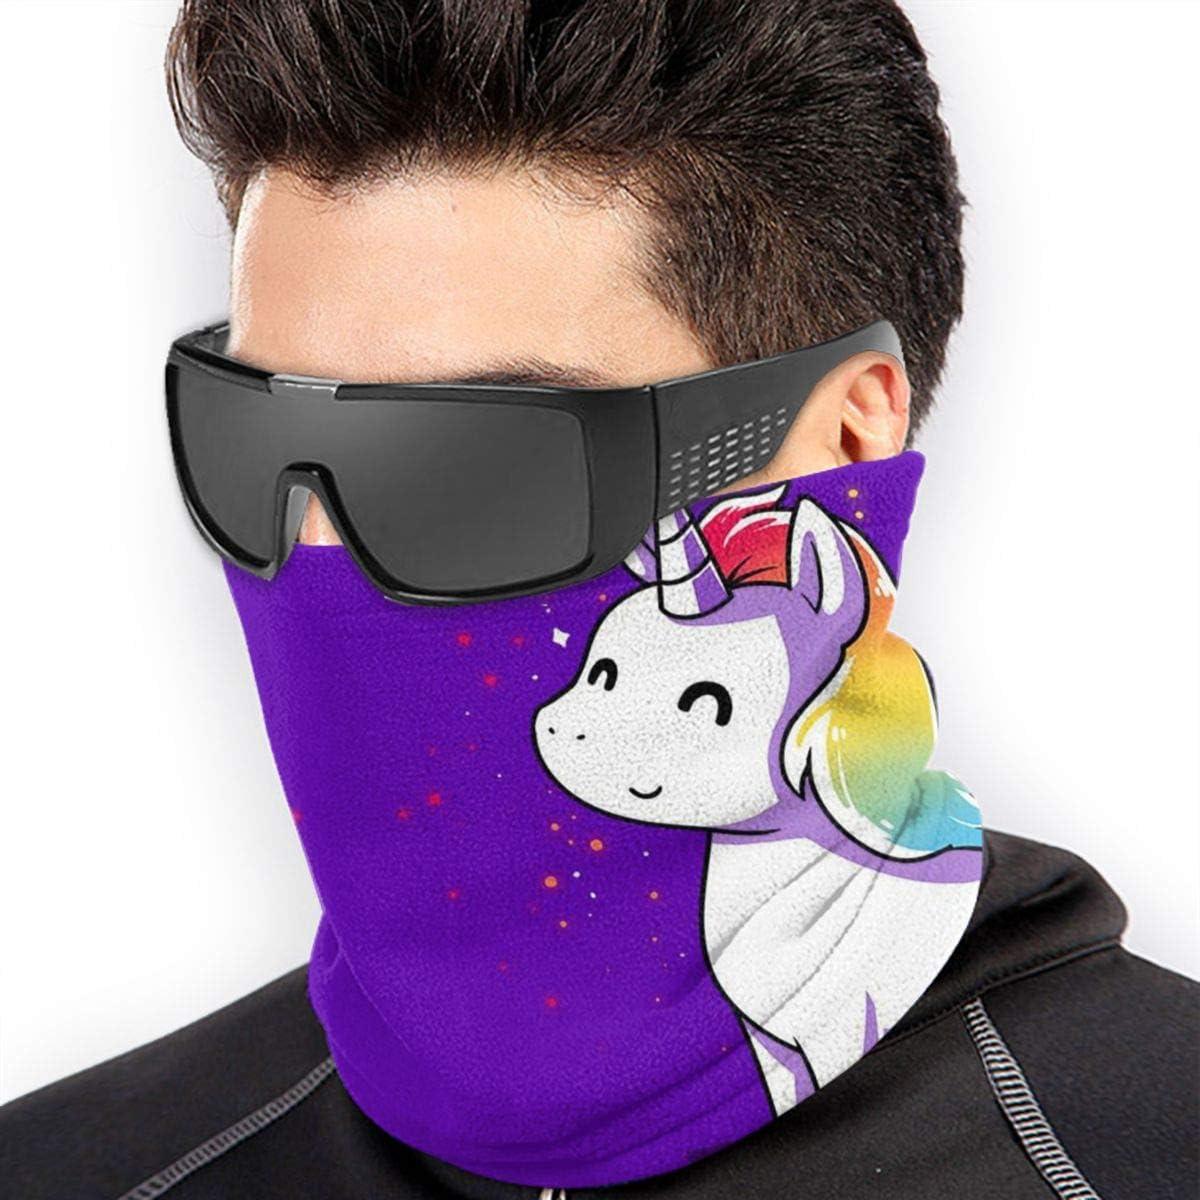 Unicorn Neck Gaiter Headwear Headband Head Wrap Scarf Mask Neck/Ear Warmers Headbands Perfect For Winter Fishing, Hiking, Running, Motorcycle Etc& Daily Wear For Men And Women